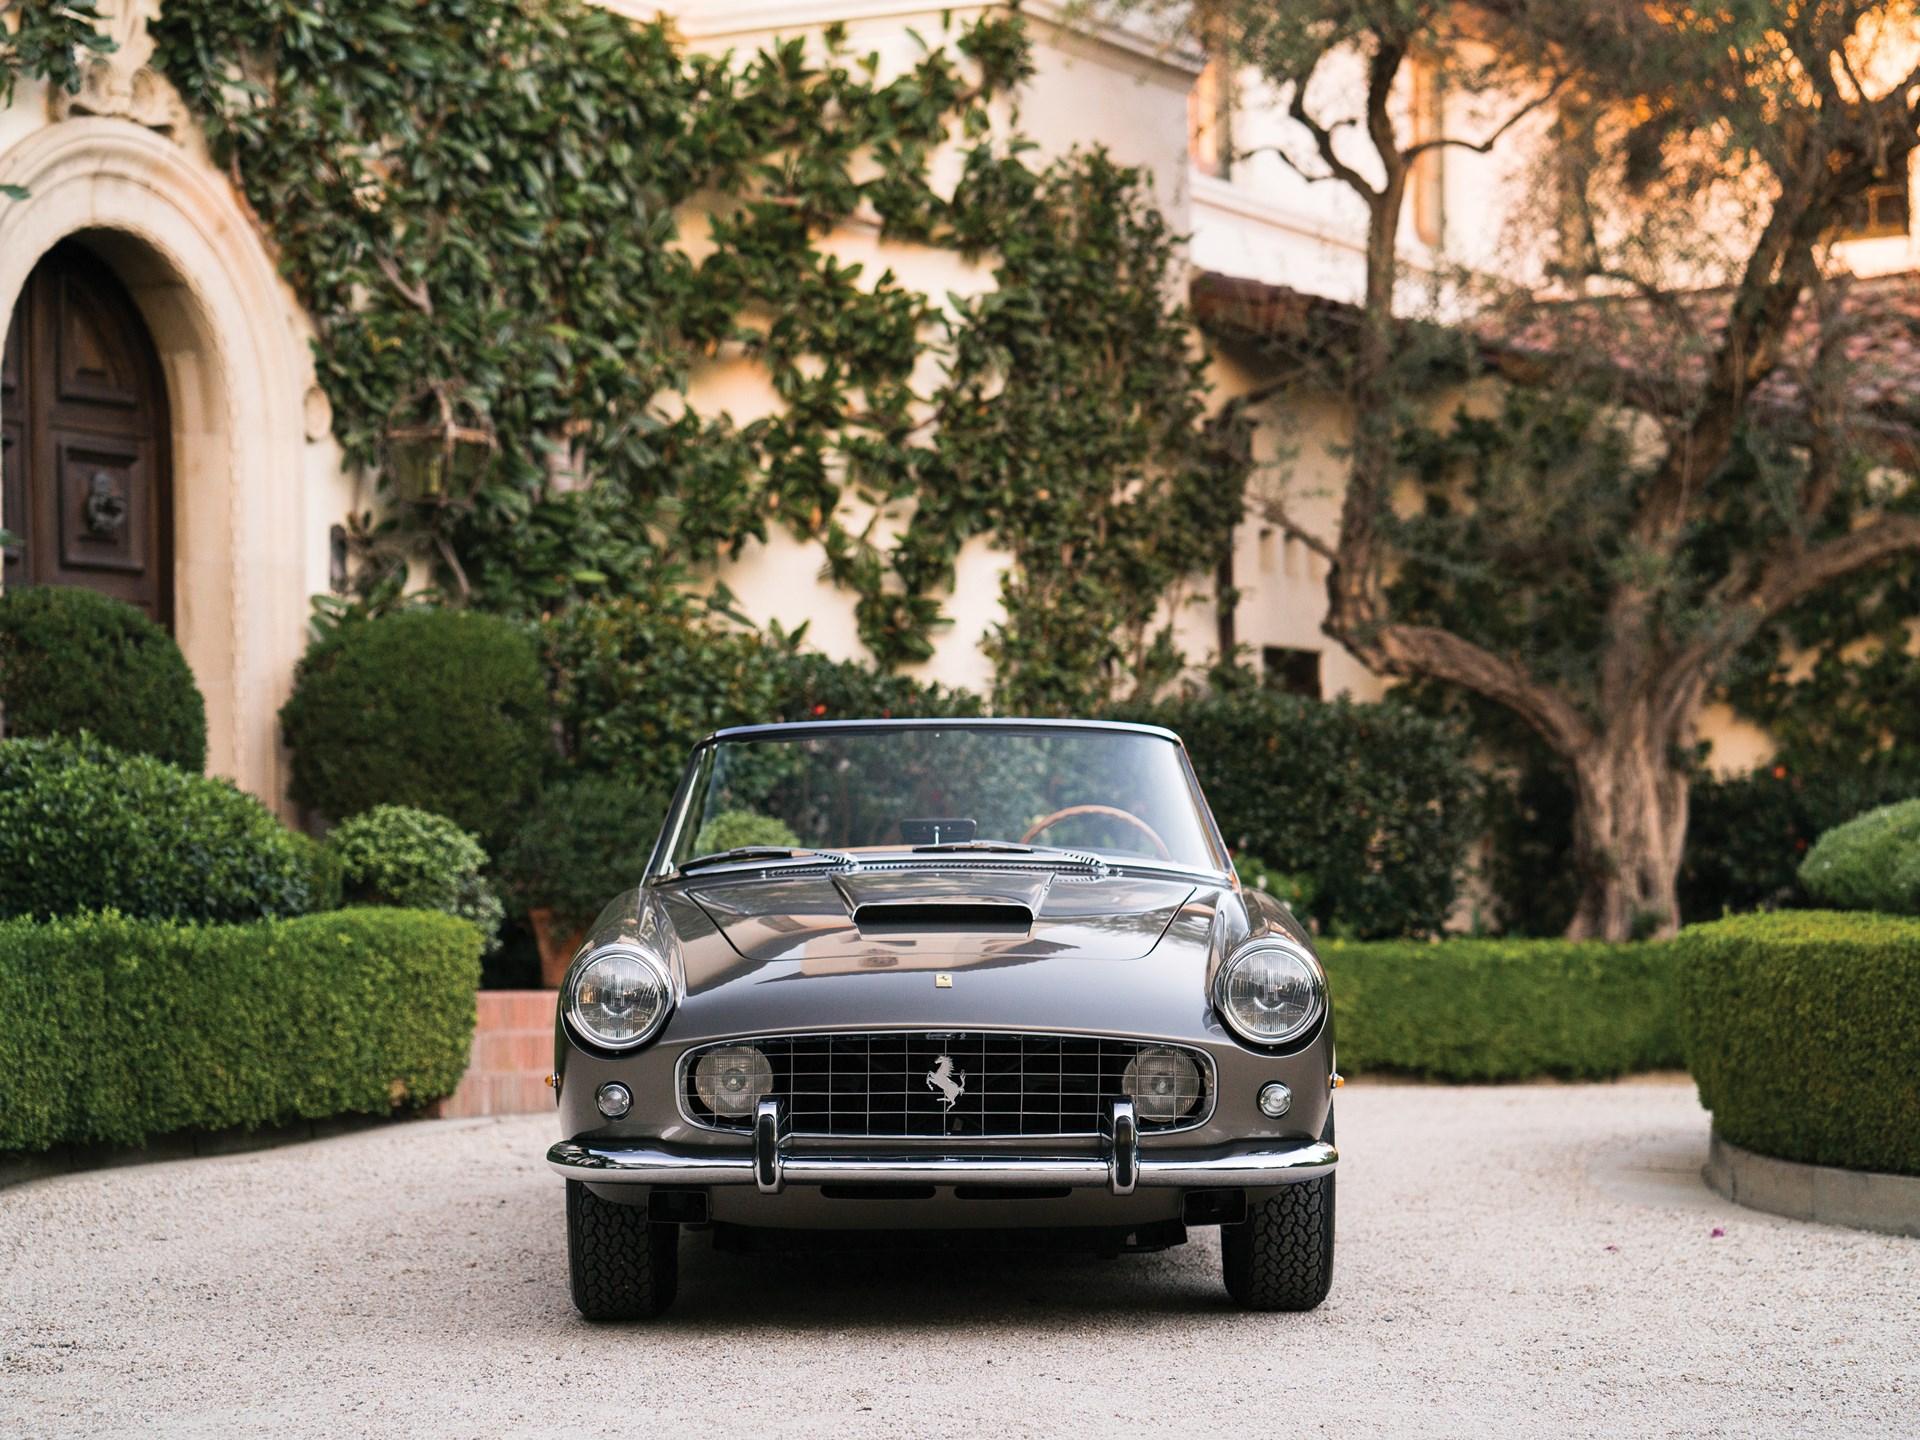 1961 Ferrari 250 GT Cabriolet Series II by Pininfarina